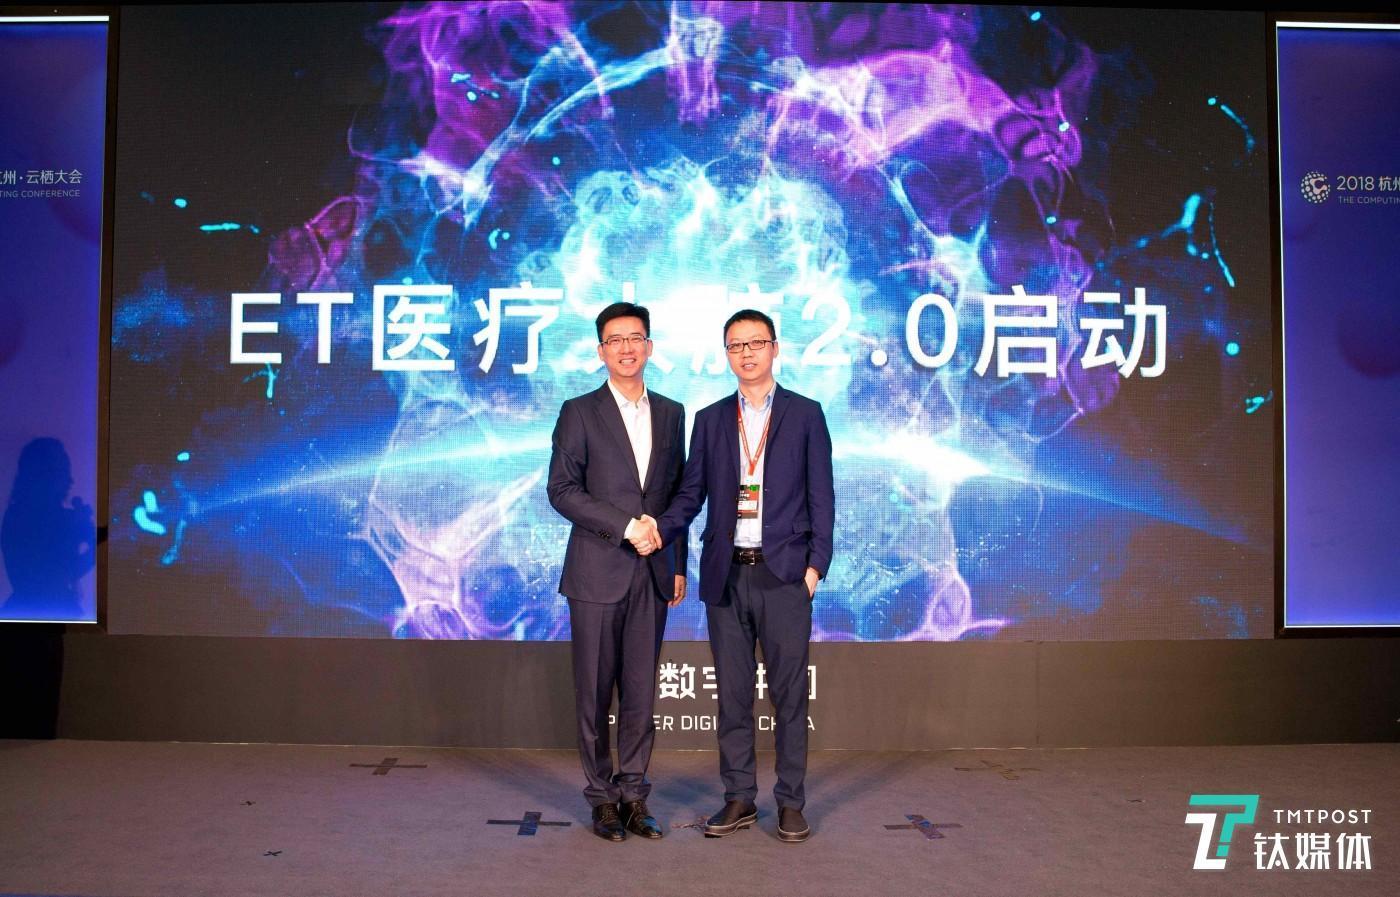 ET医疗大脑2.0启动仪式,左为阿里云总裁胡晓明、右为阿里健康董事会主席吴泳铭